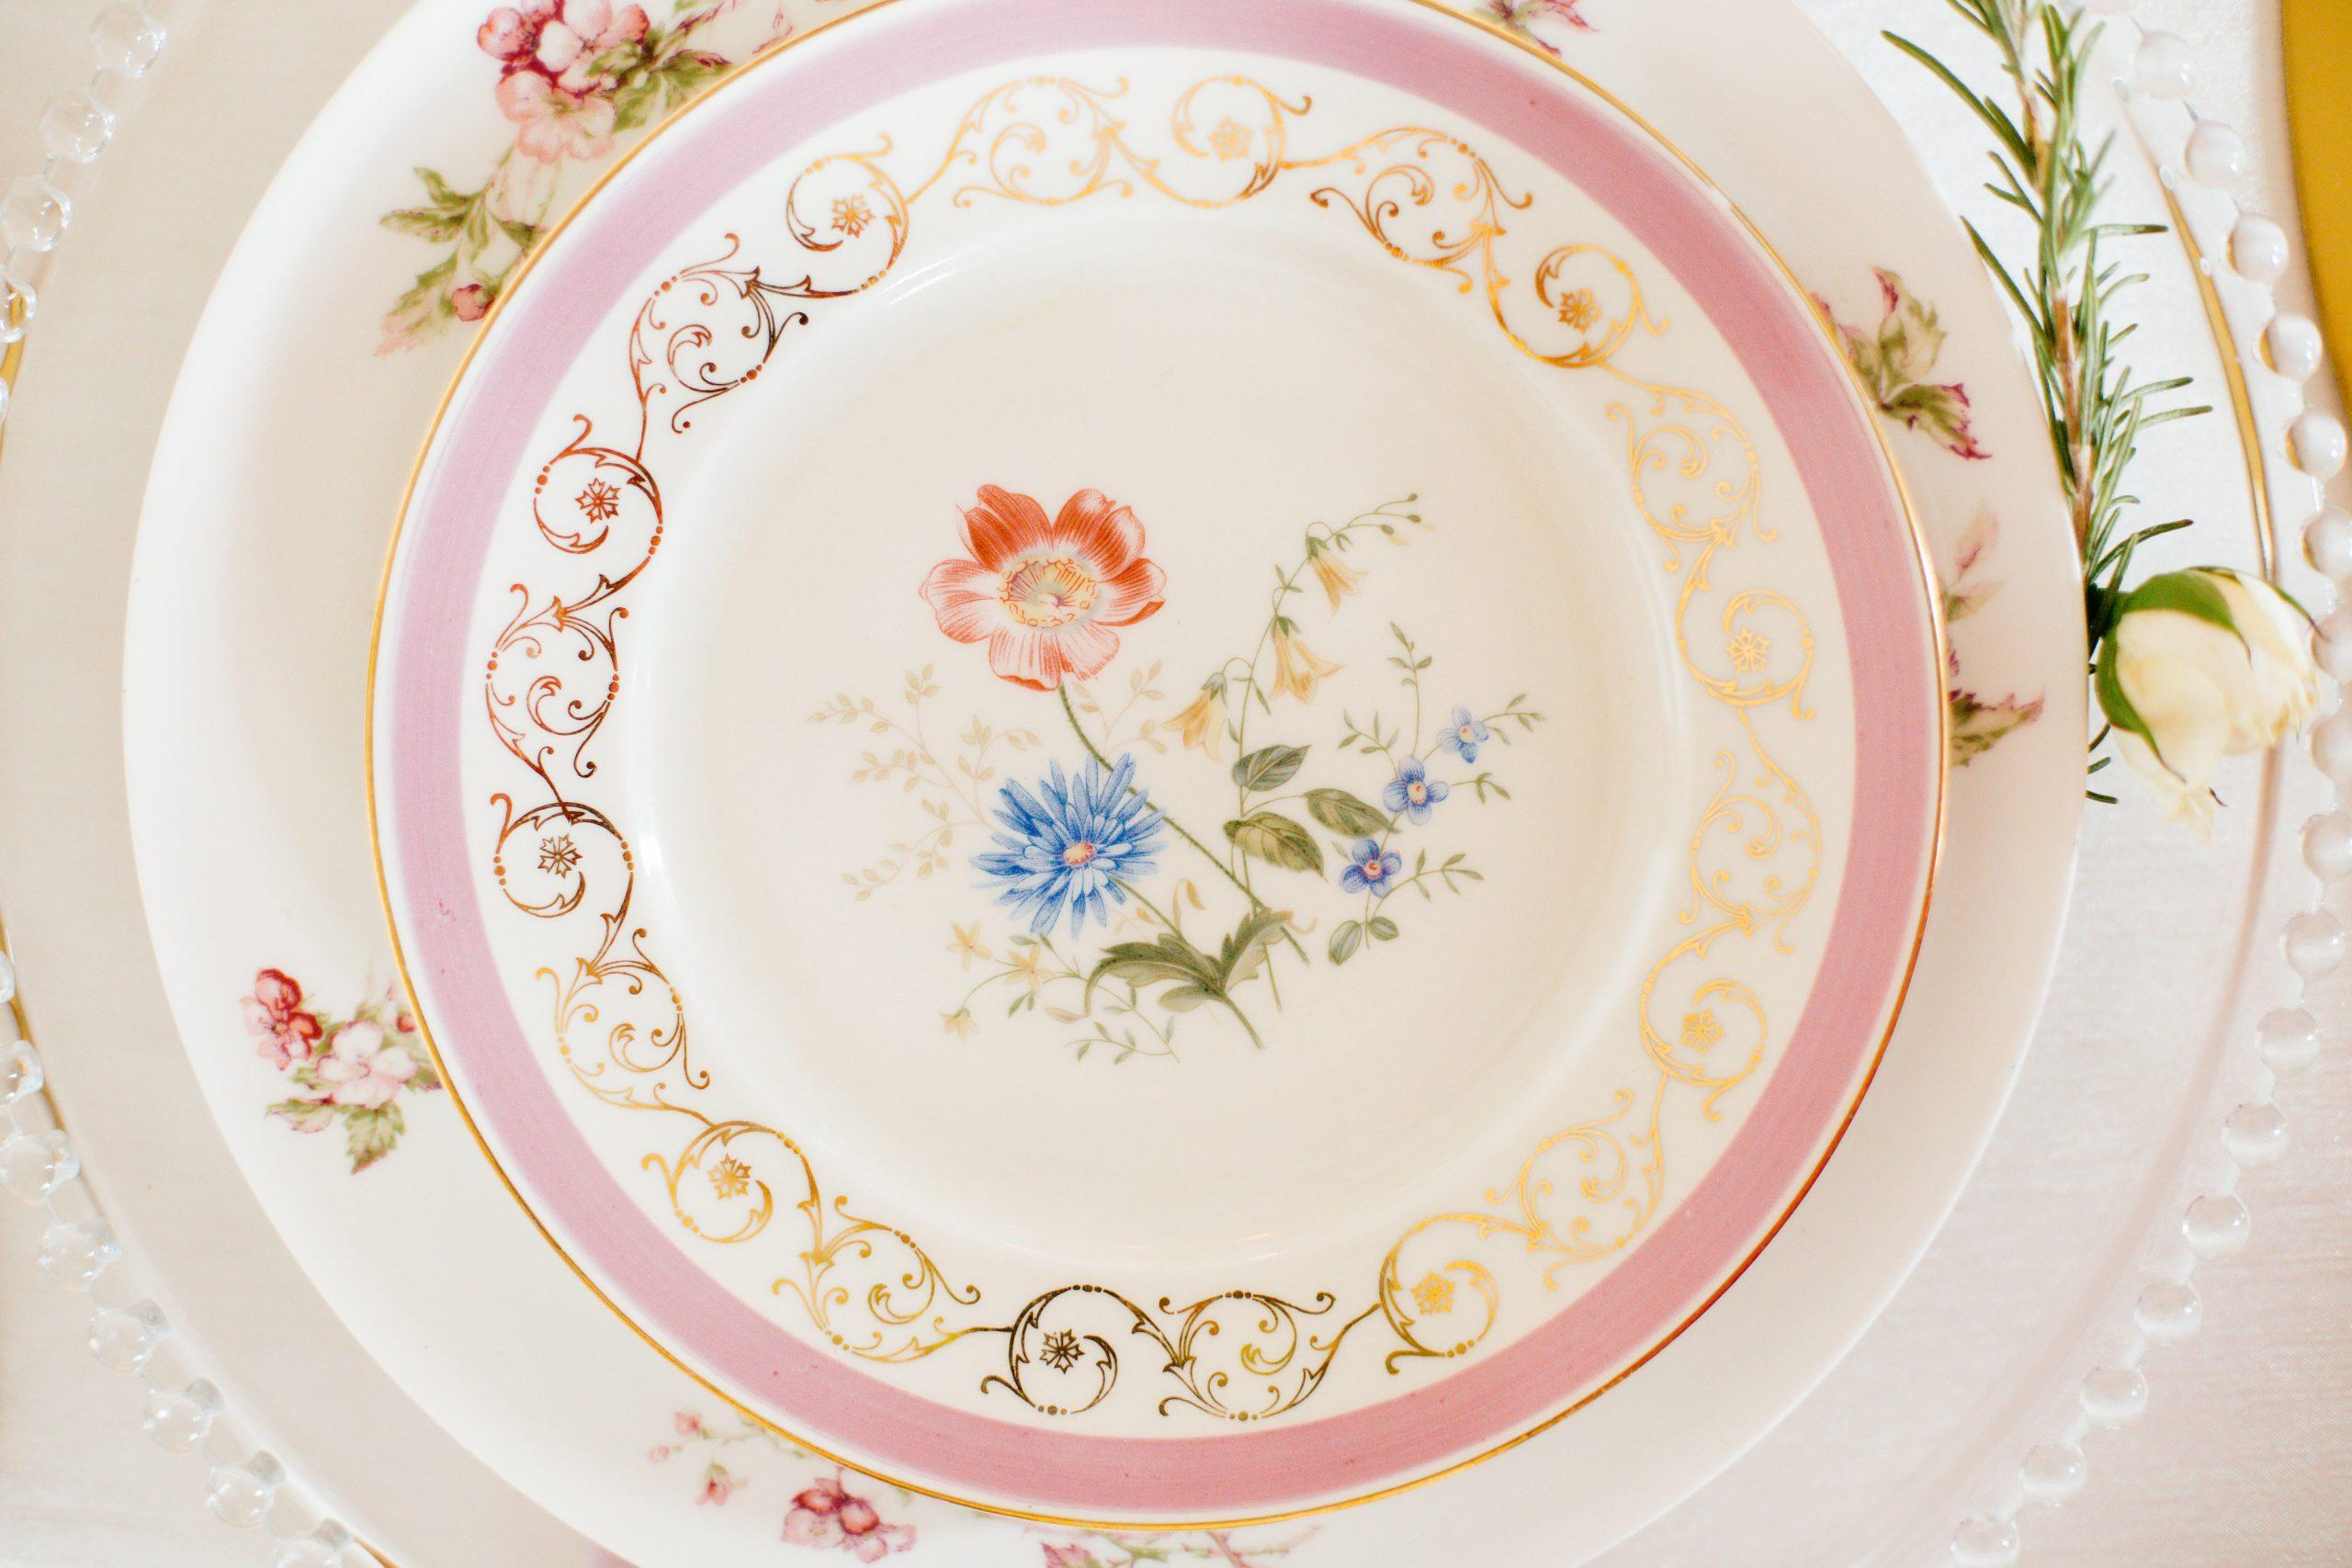 Cru Vintage Rentals - plates